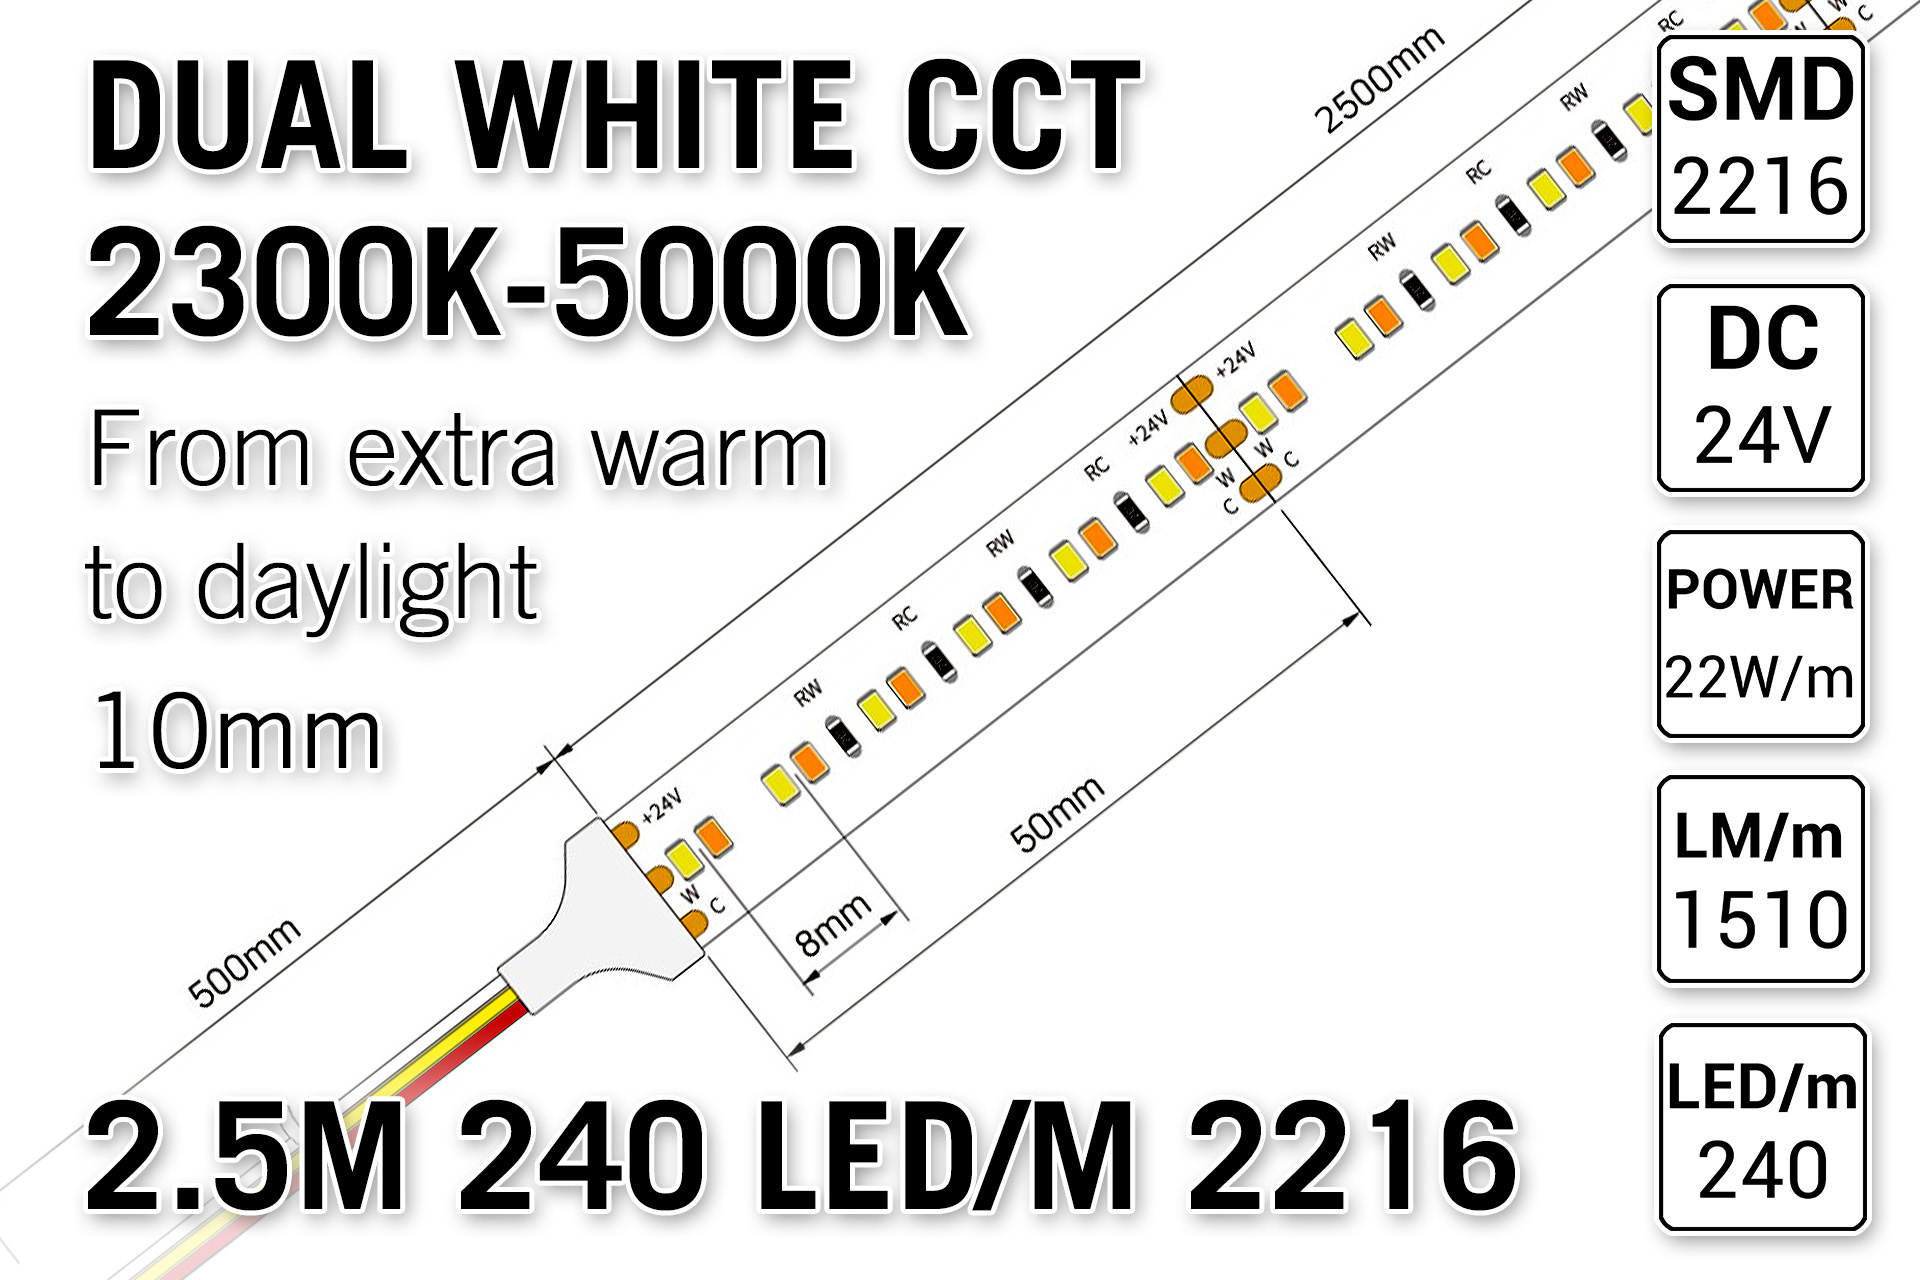 AppLamp ProLine PRO LINE Dual Wit 2300K~5000K CCT Led Strip | 2,5m 240 Leds pm Type 2216 24V - Losse Strip